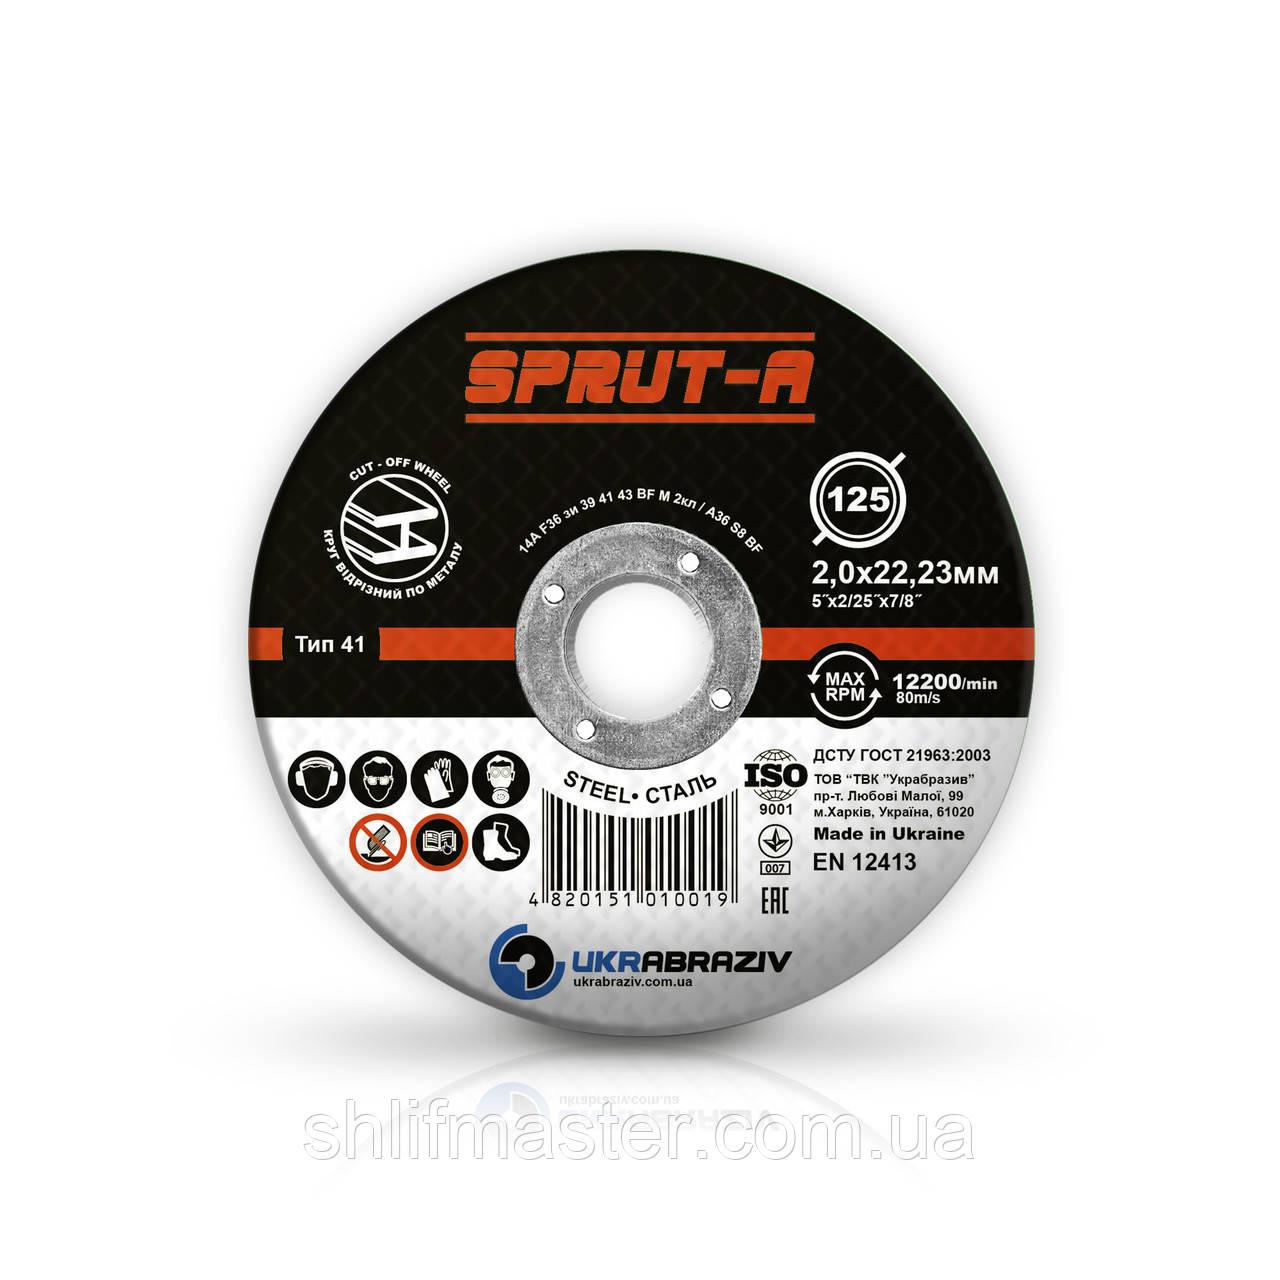 Круги отрезные для болгарки для резки металла (Спрут) SPRUT 125х2.0х22.23